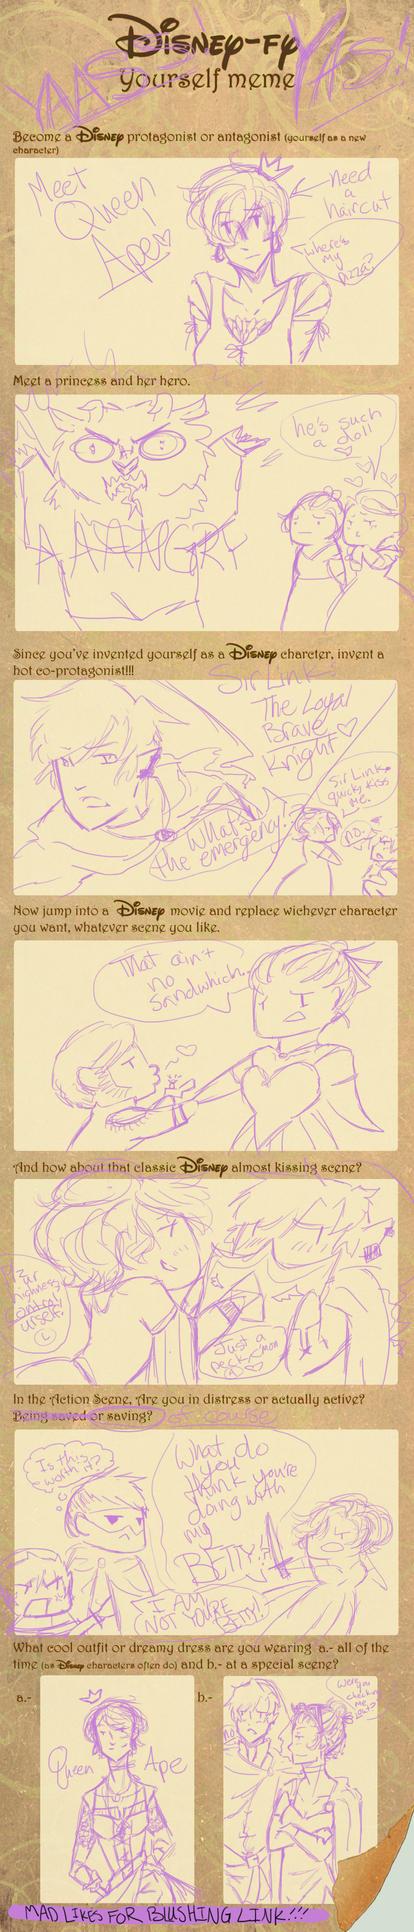 Disney-fy Yourself Meme by twilightearth